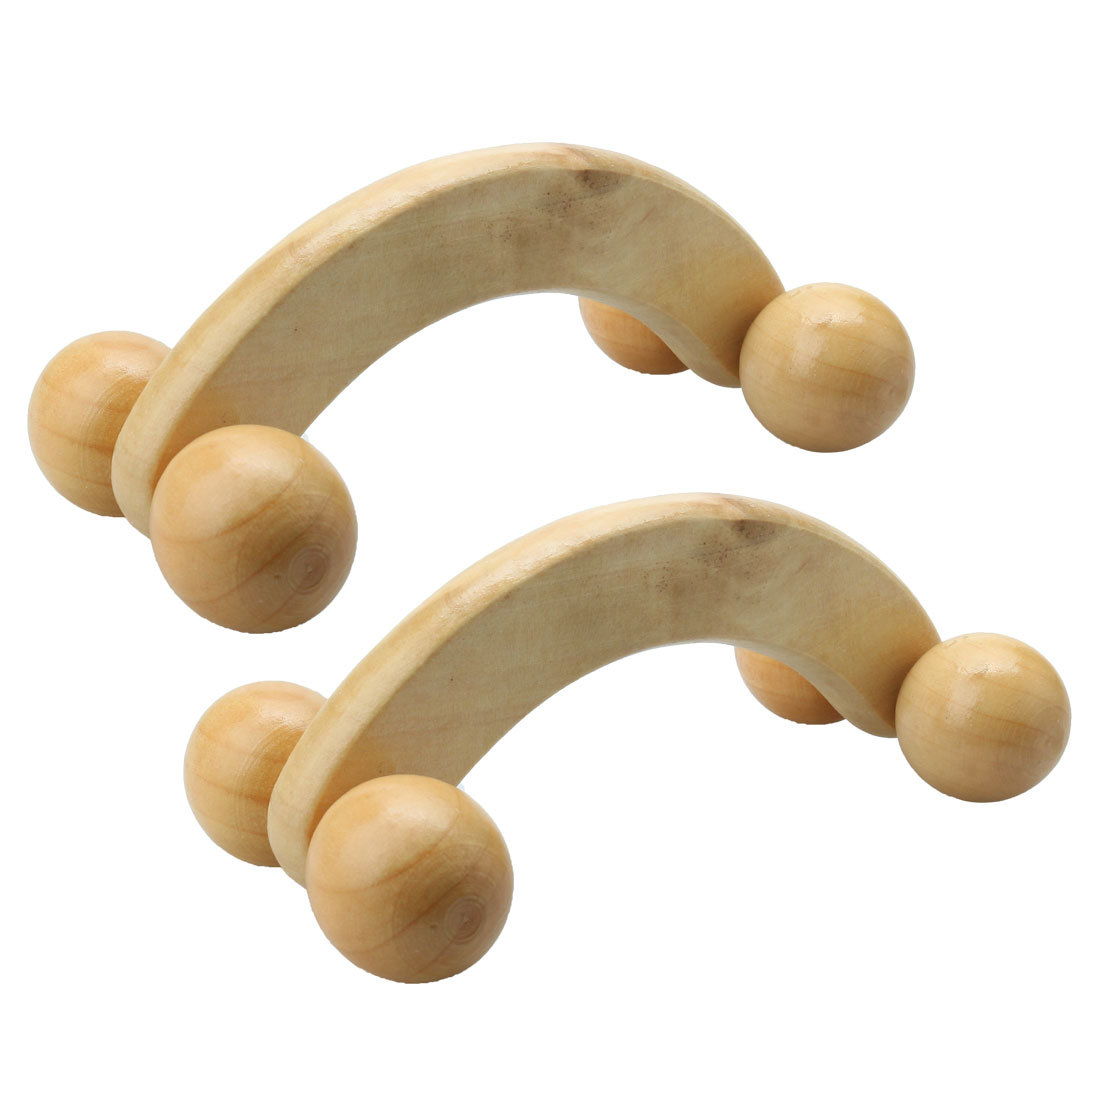 Antislip Handheld Yellow 4 Wheels Wooden Body Massage Roller 2 Pcs